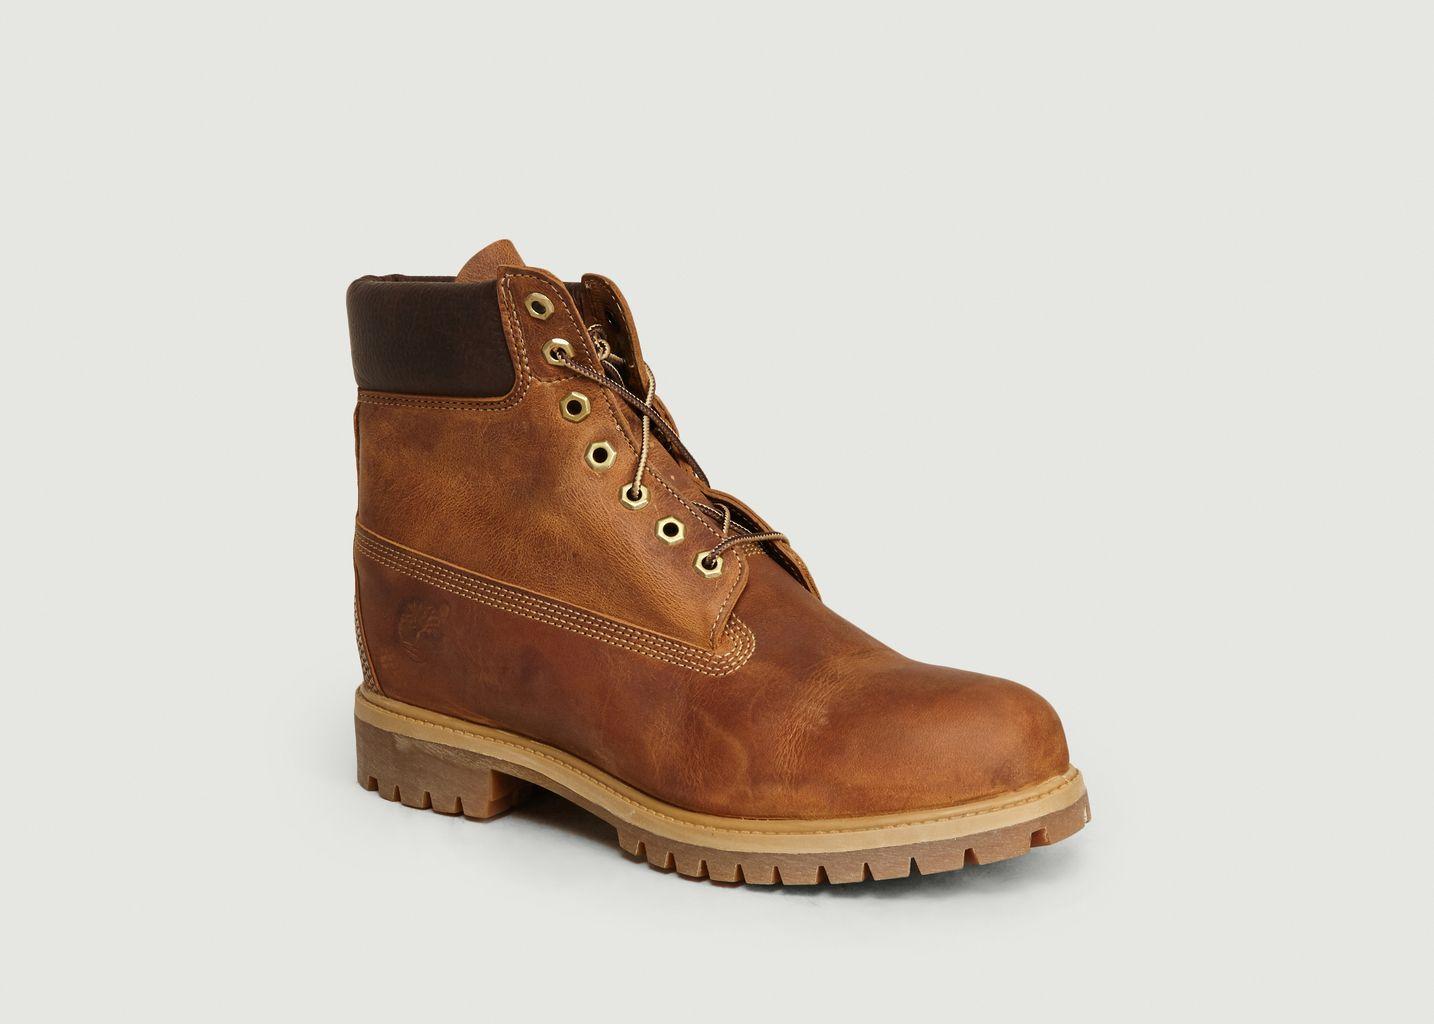 Glosario Príncipe fecha  Boots Héritage Six Inch Imperméable Marron Timberland | L'Exception